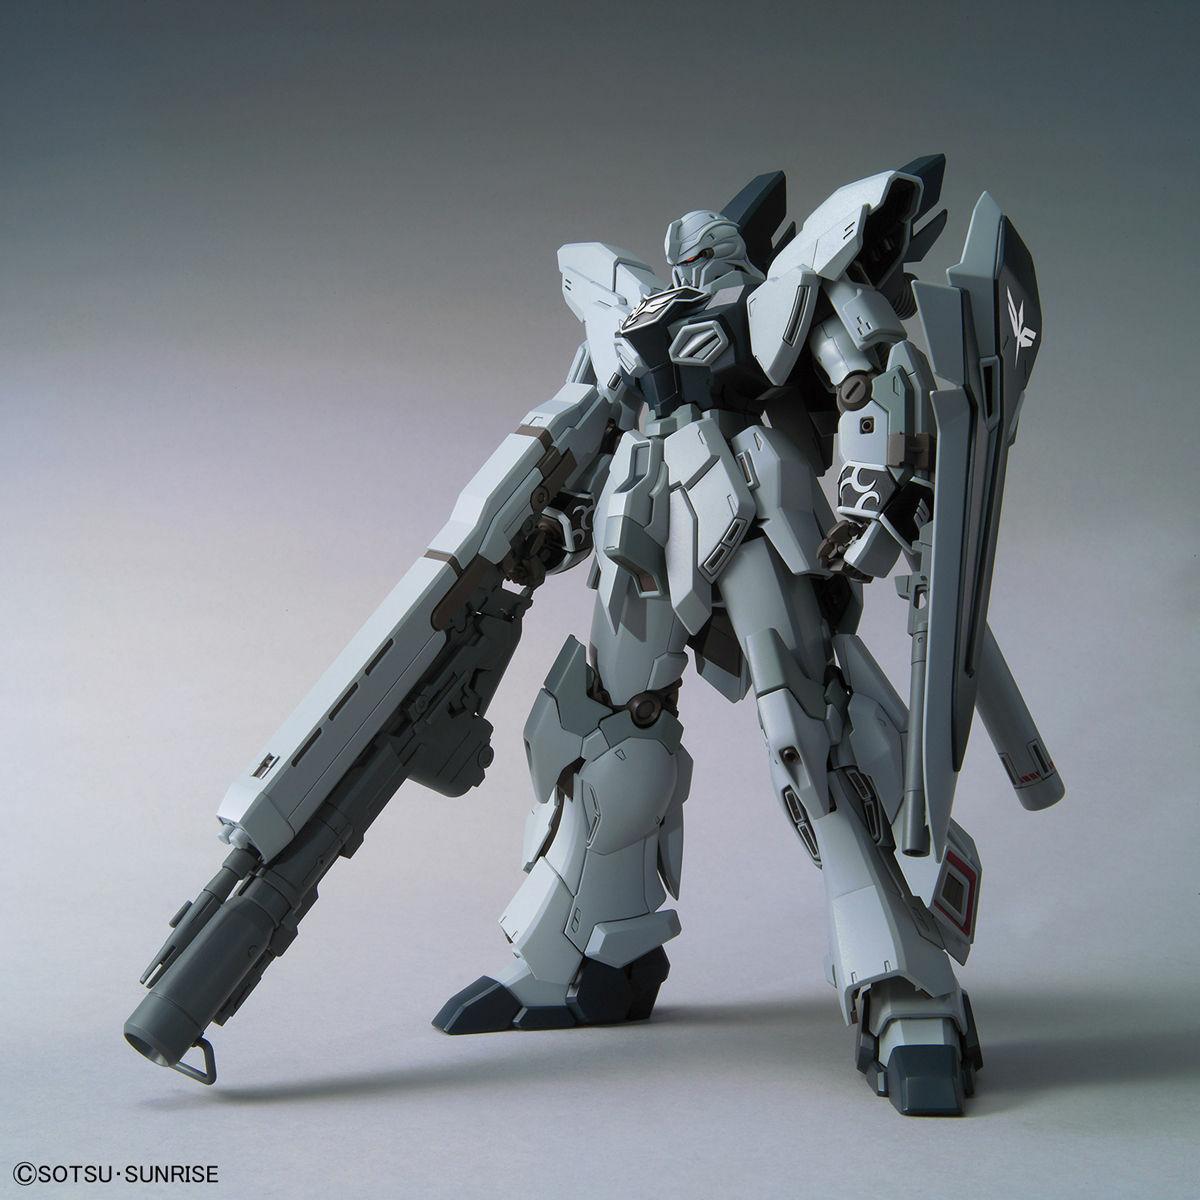 MG 1/100 SINANJU STEIN (NARRATIVE Ver.) - Gundam NT - Bandai